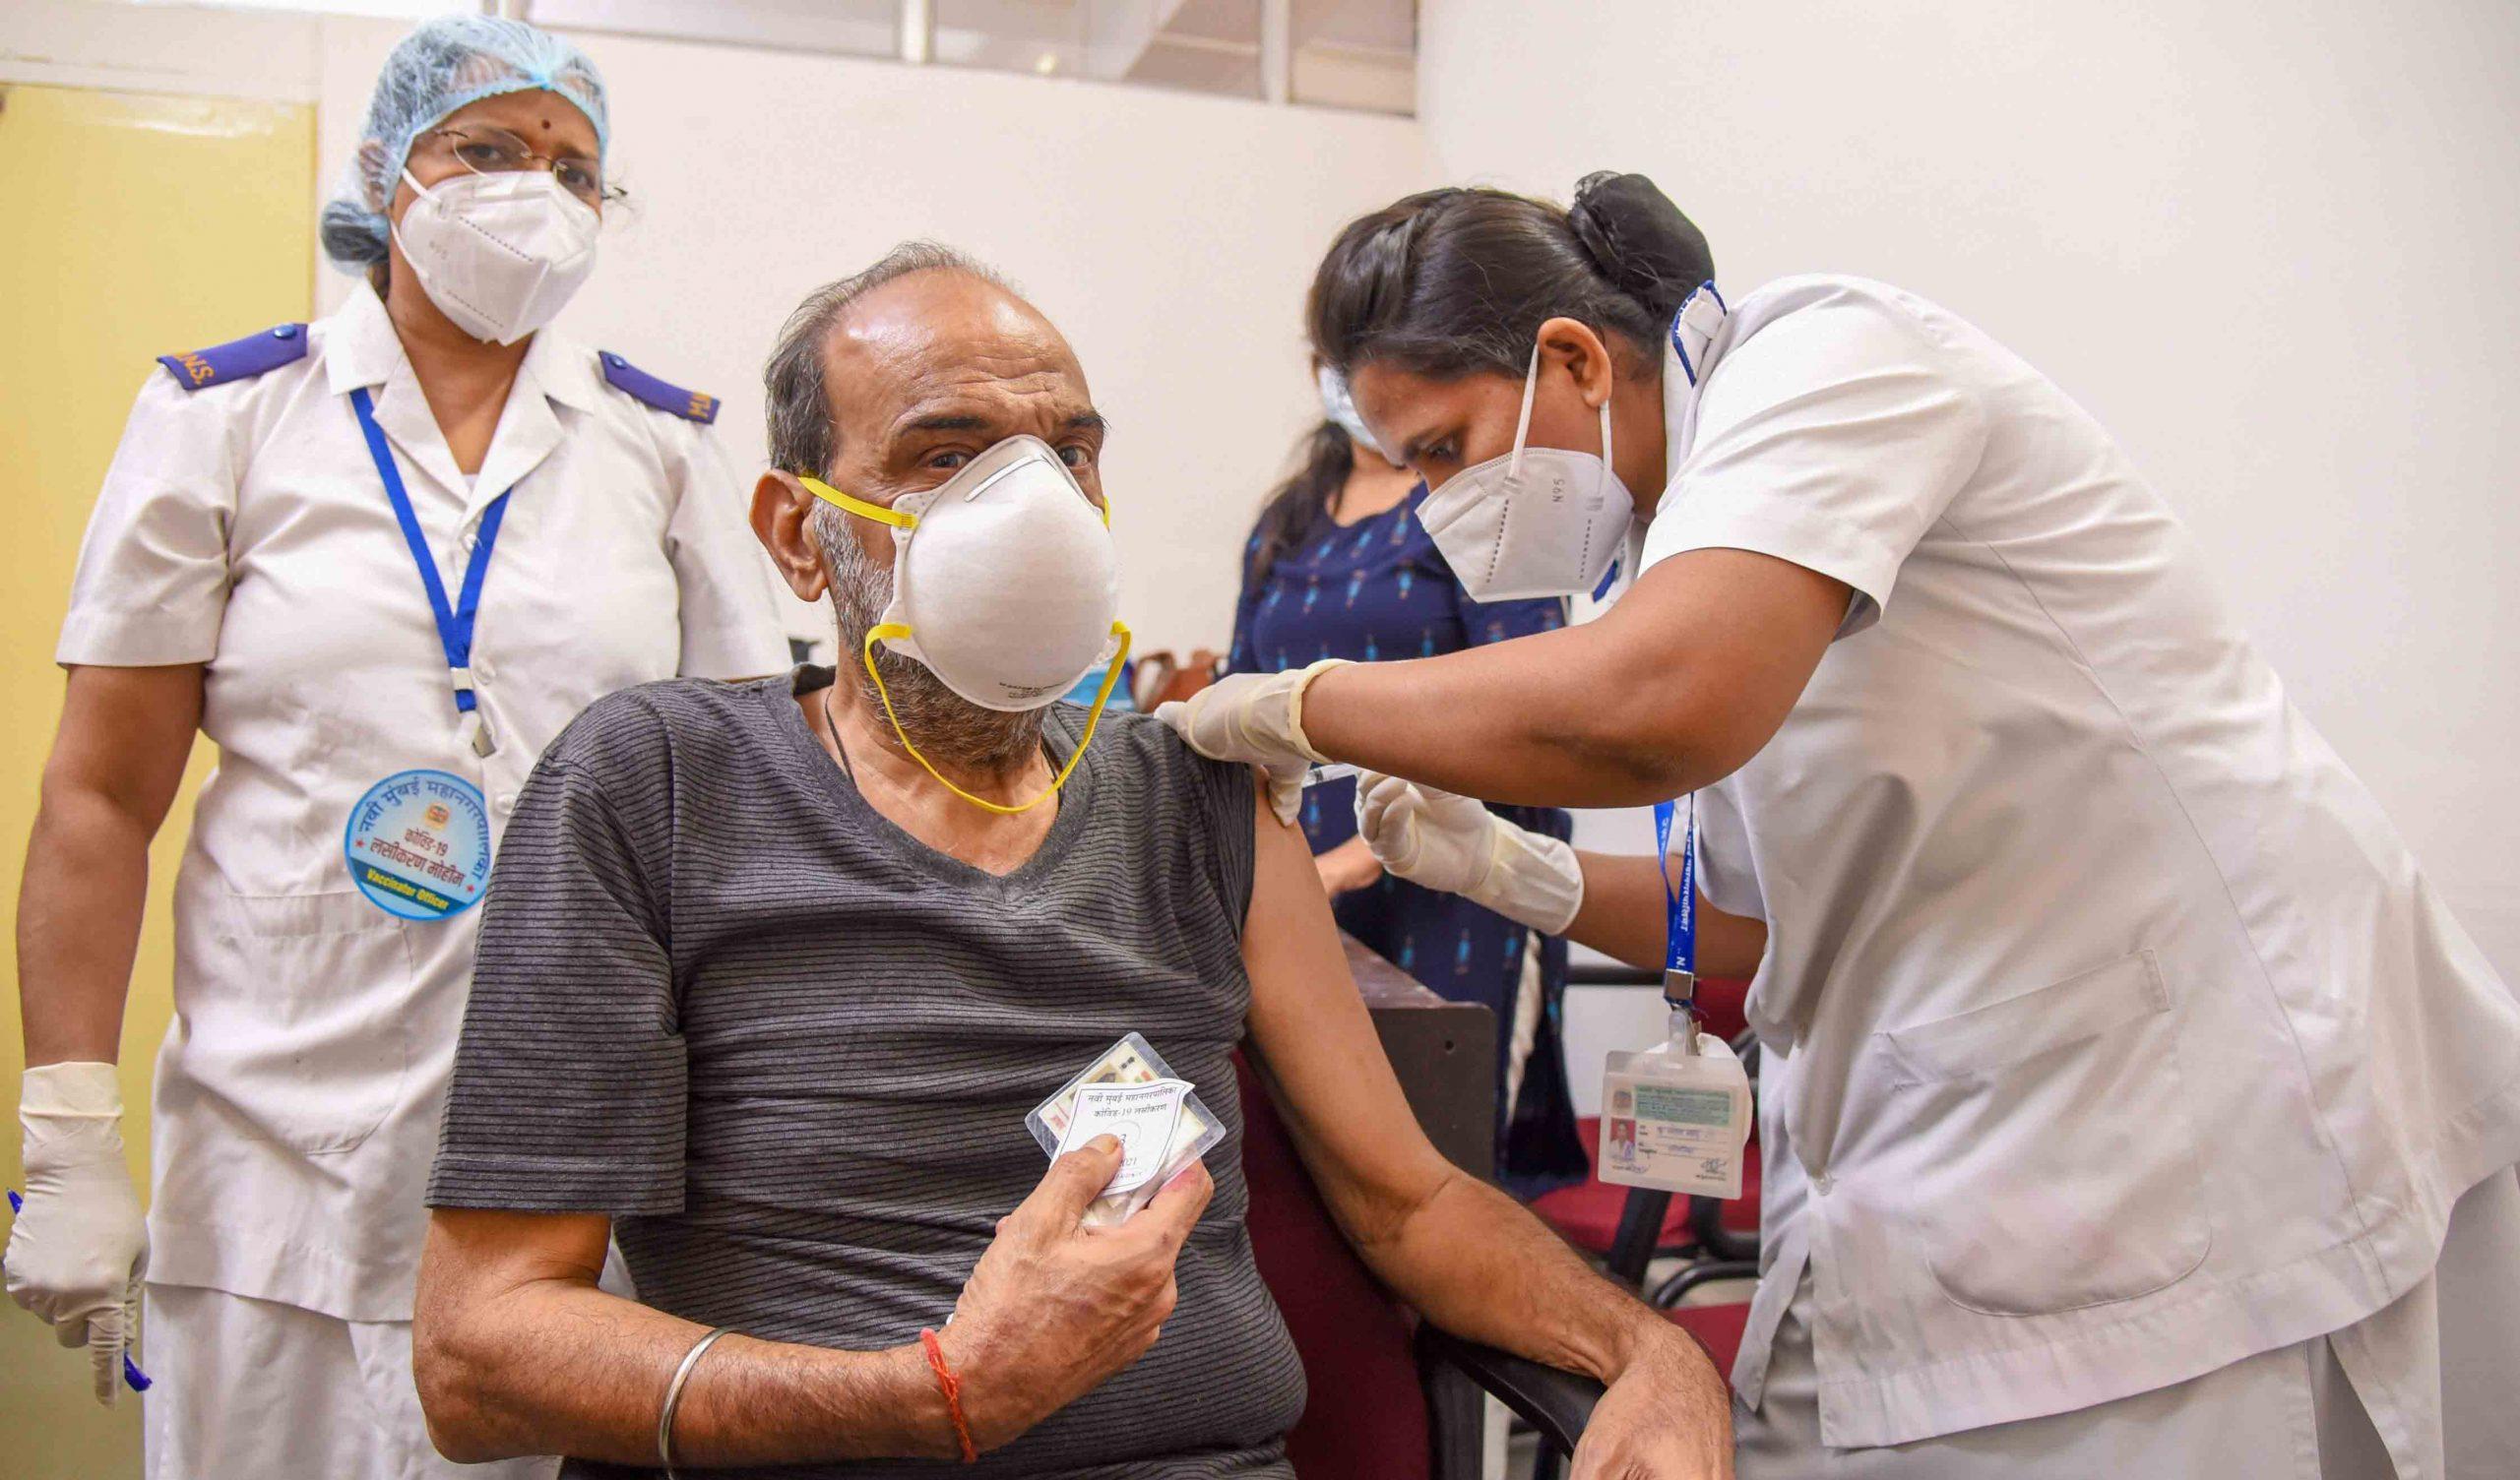 More than 2.6 crore COVID-19 vaccine doses administered till Saturday: Health Ministry - OrissaPOST